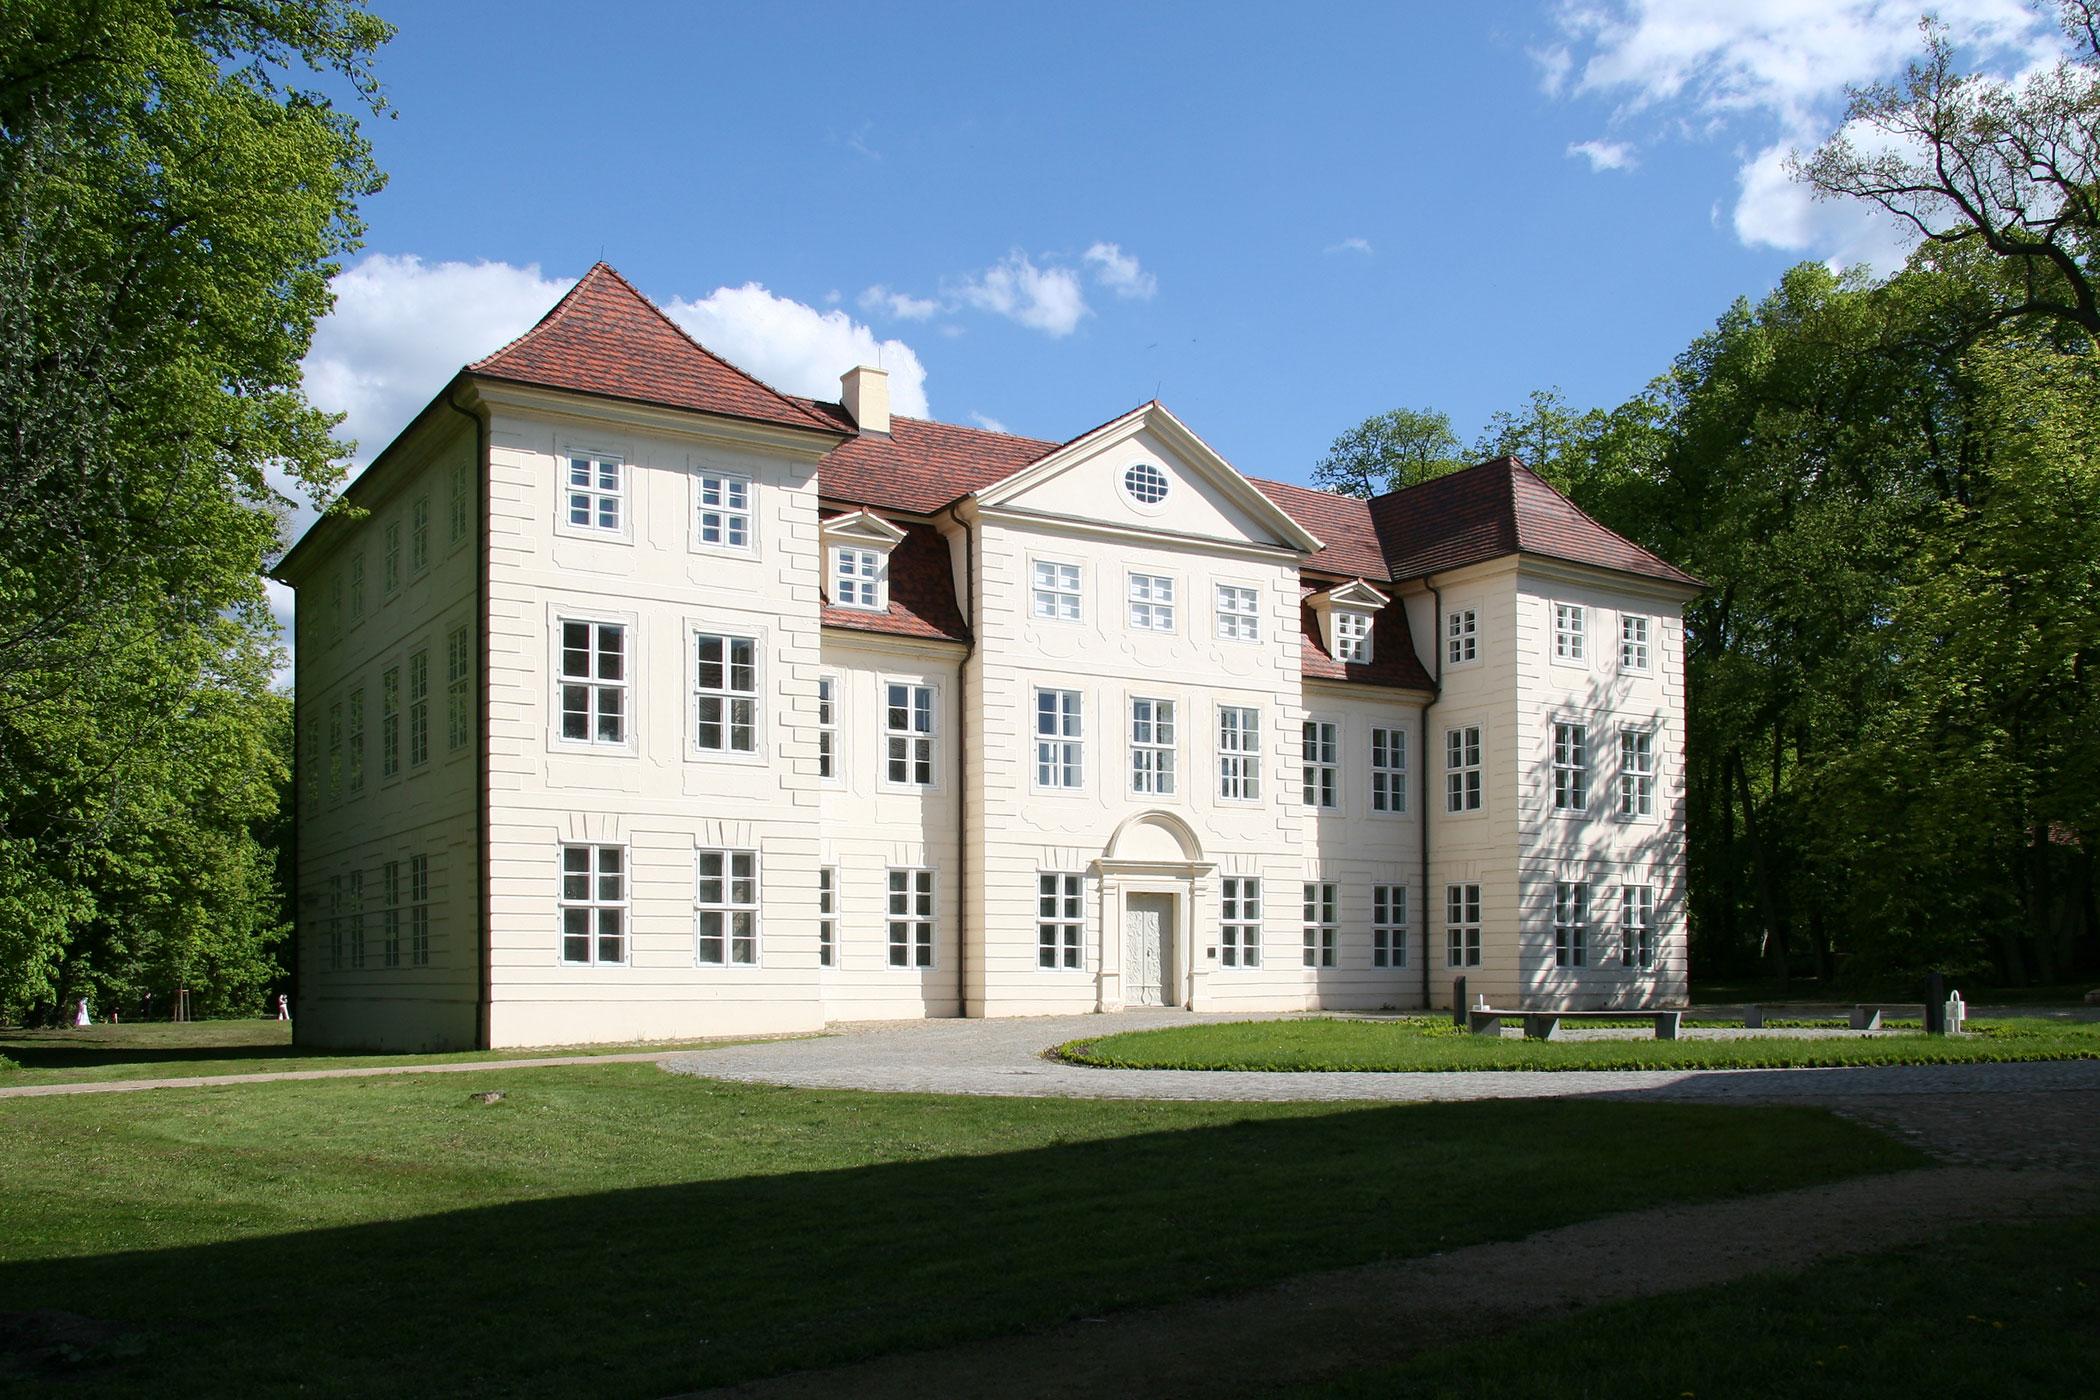 Rund um das Schloss Mirow